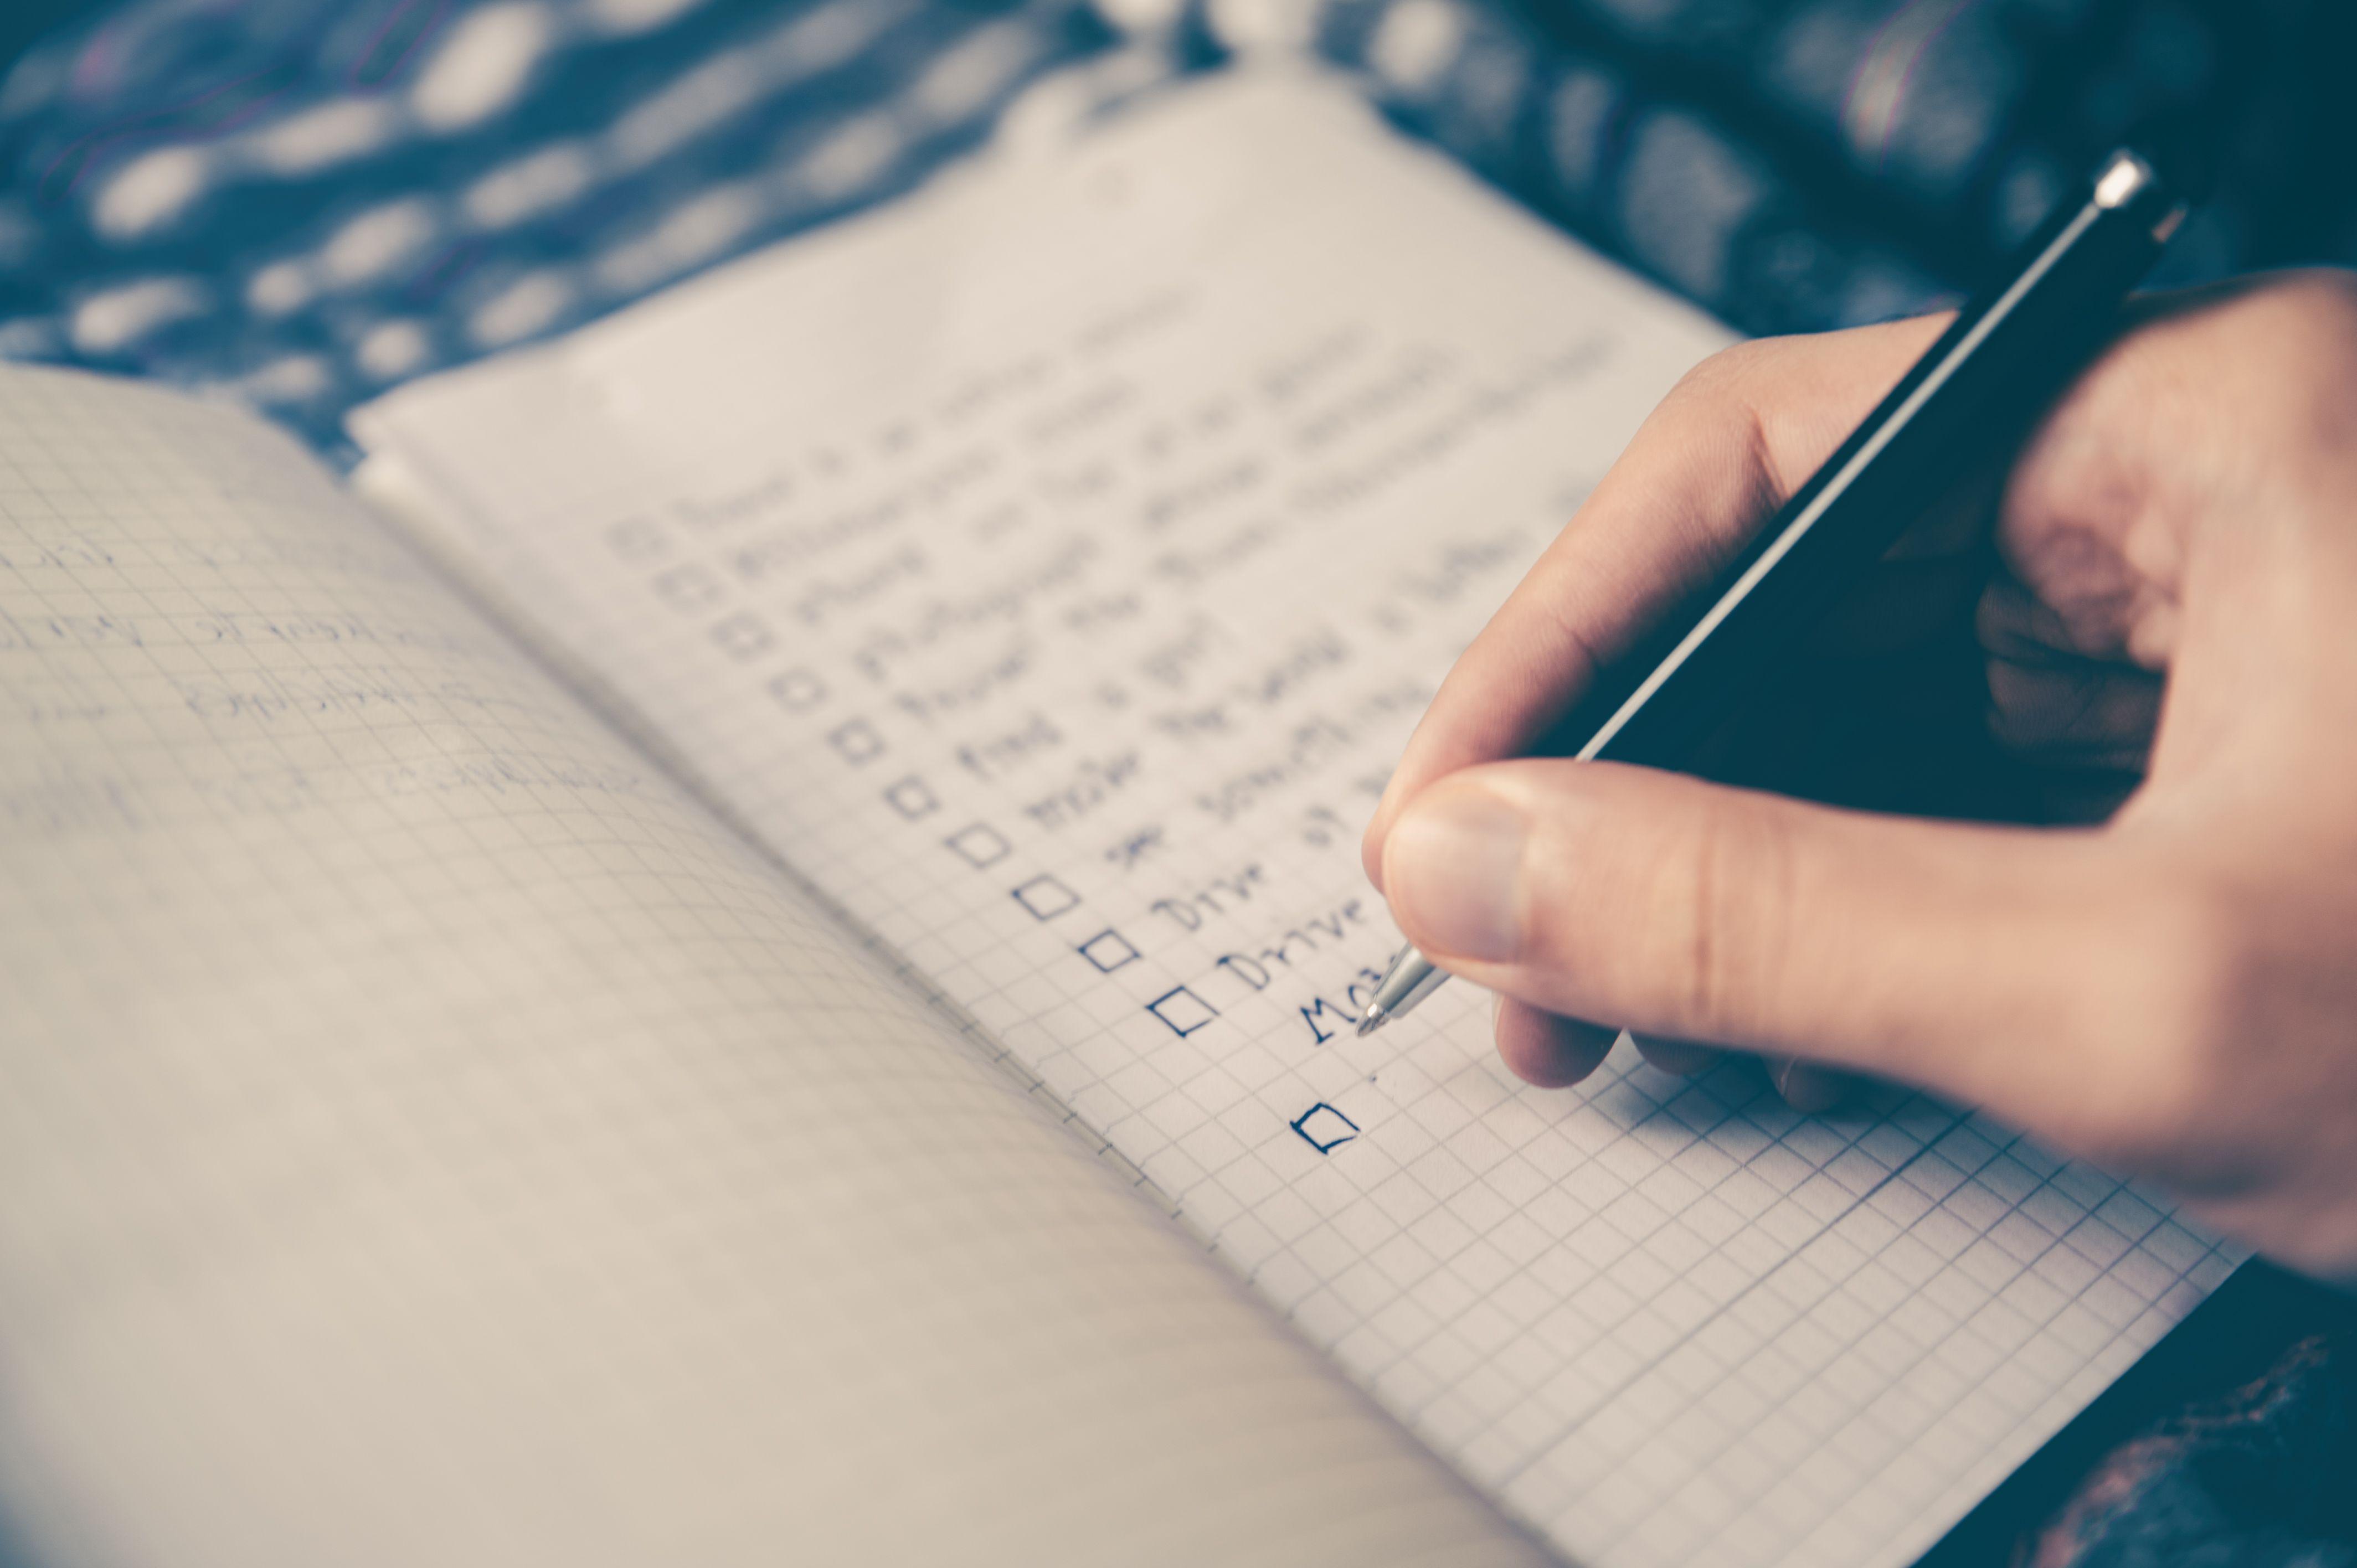 list being written